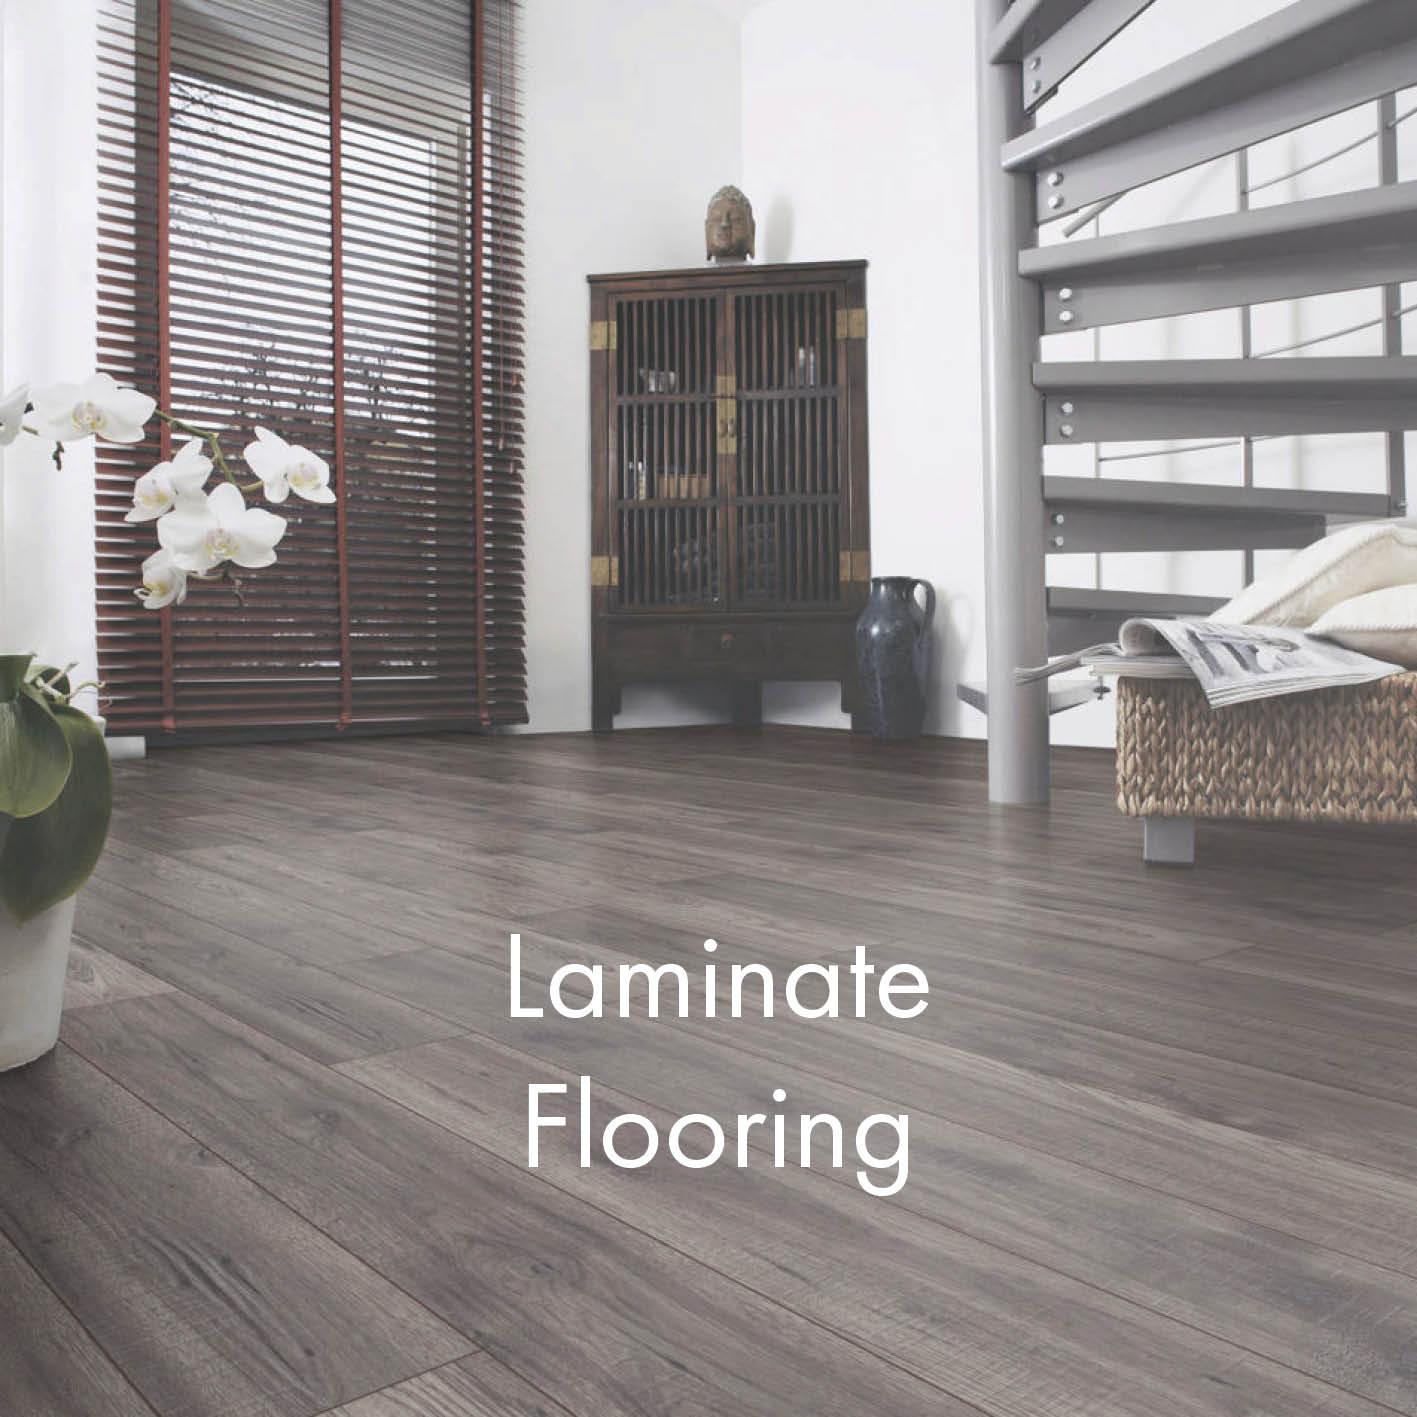 Laminate flooring button.jpg